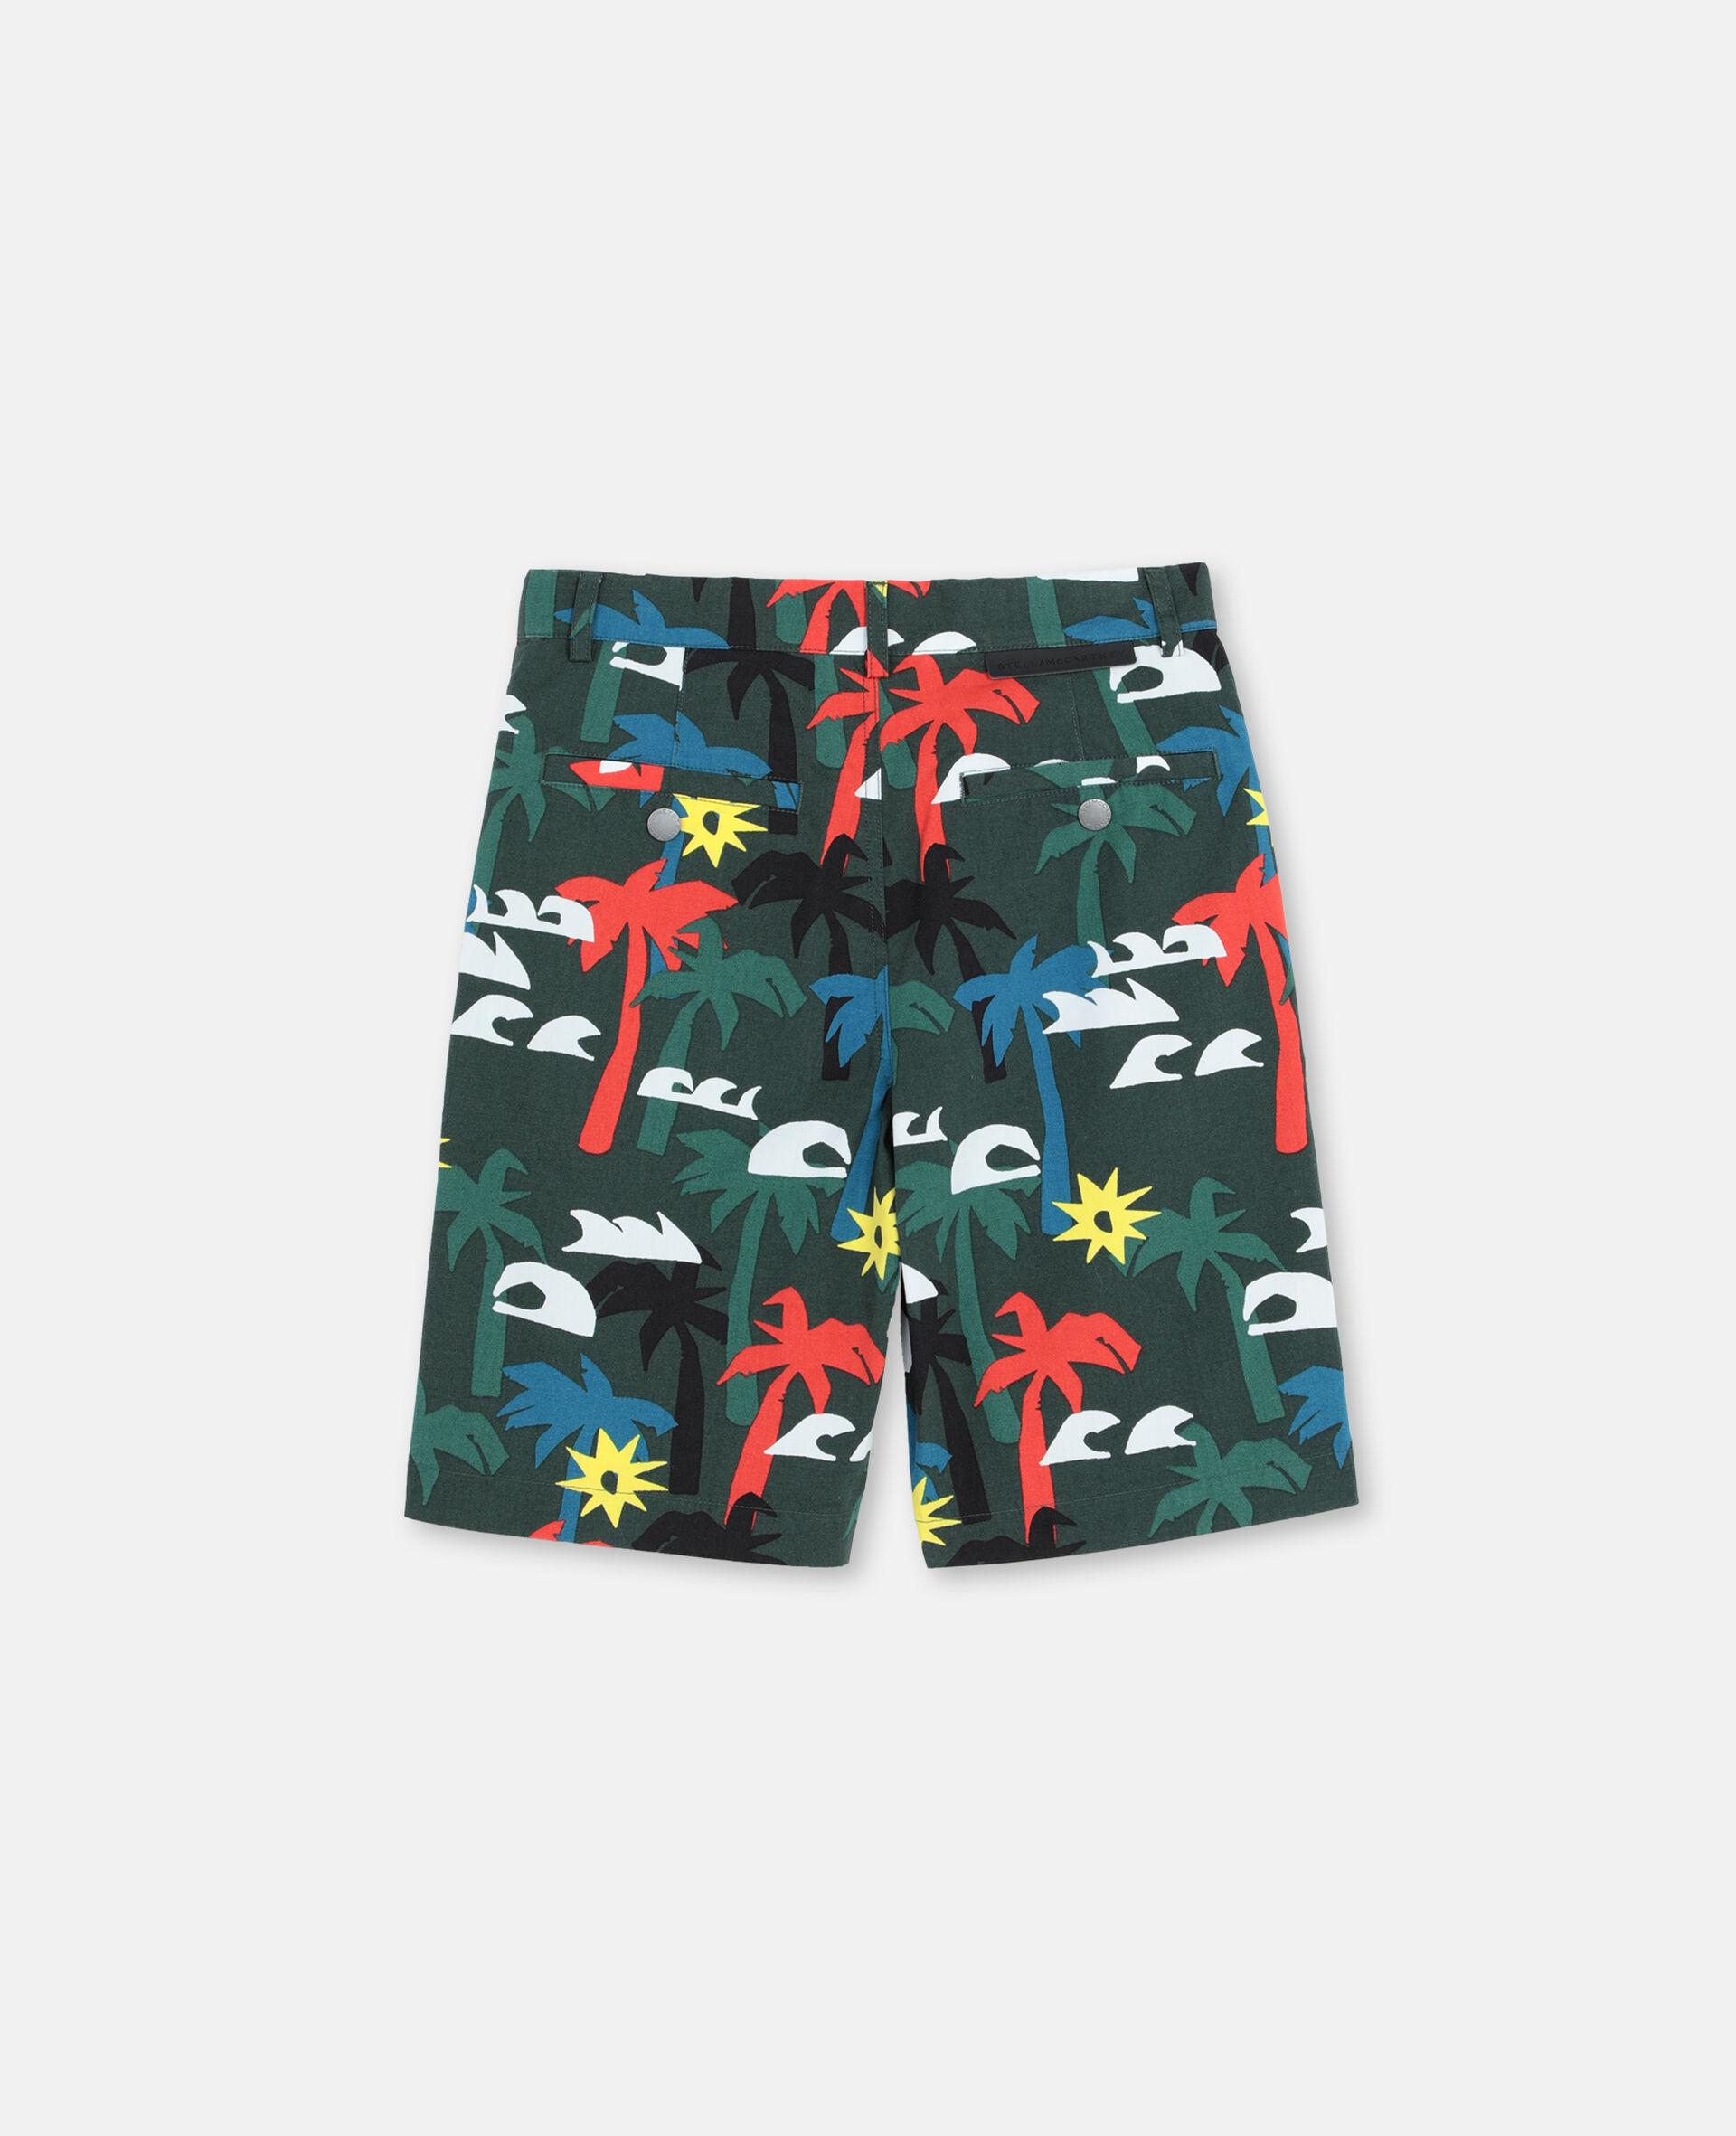 Multicolour Palm Trees Cotton Shorts -Multicolour-large image number 3